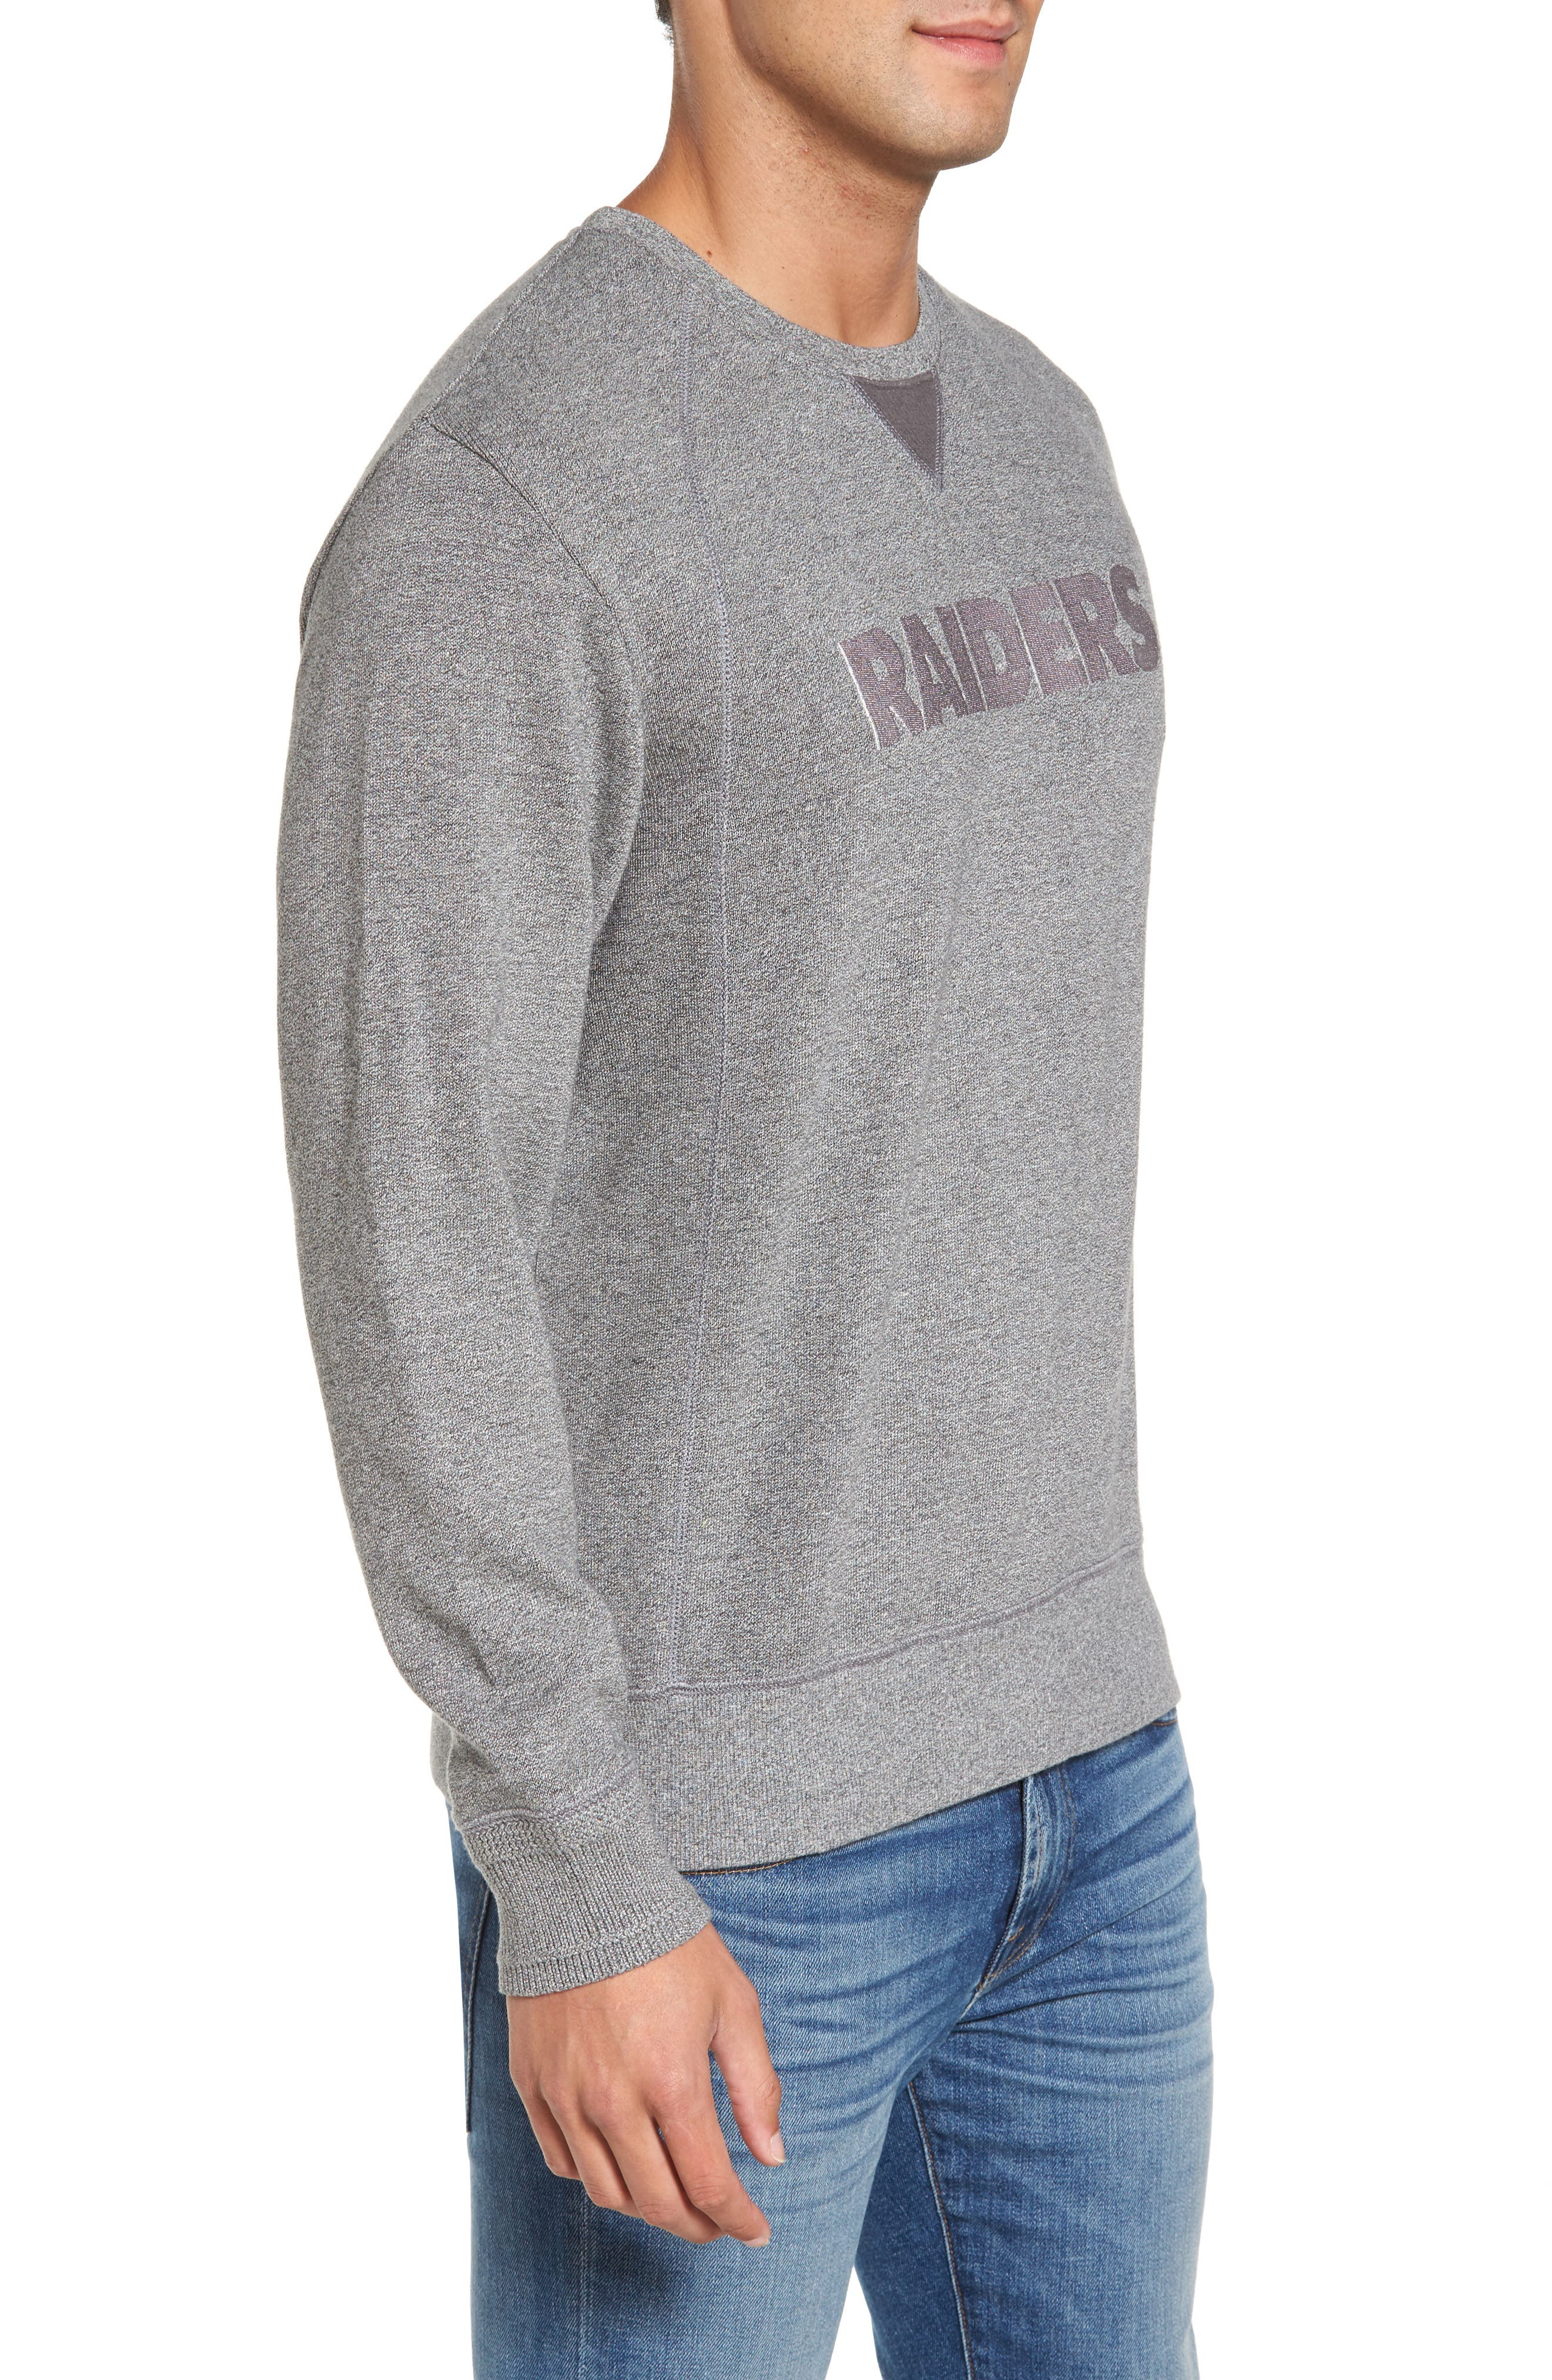 NFL Stitch of Liberty Embroidered Crewneck Sweatshirt,                             Alternate thumbnail 85, color,